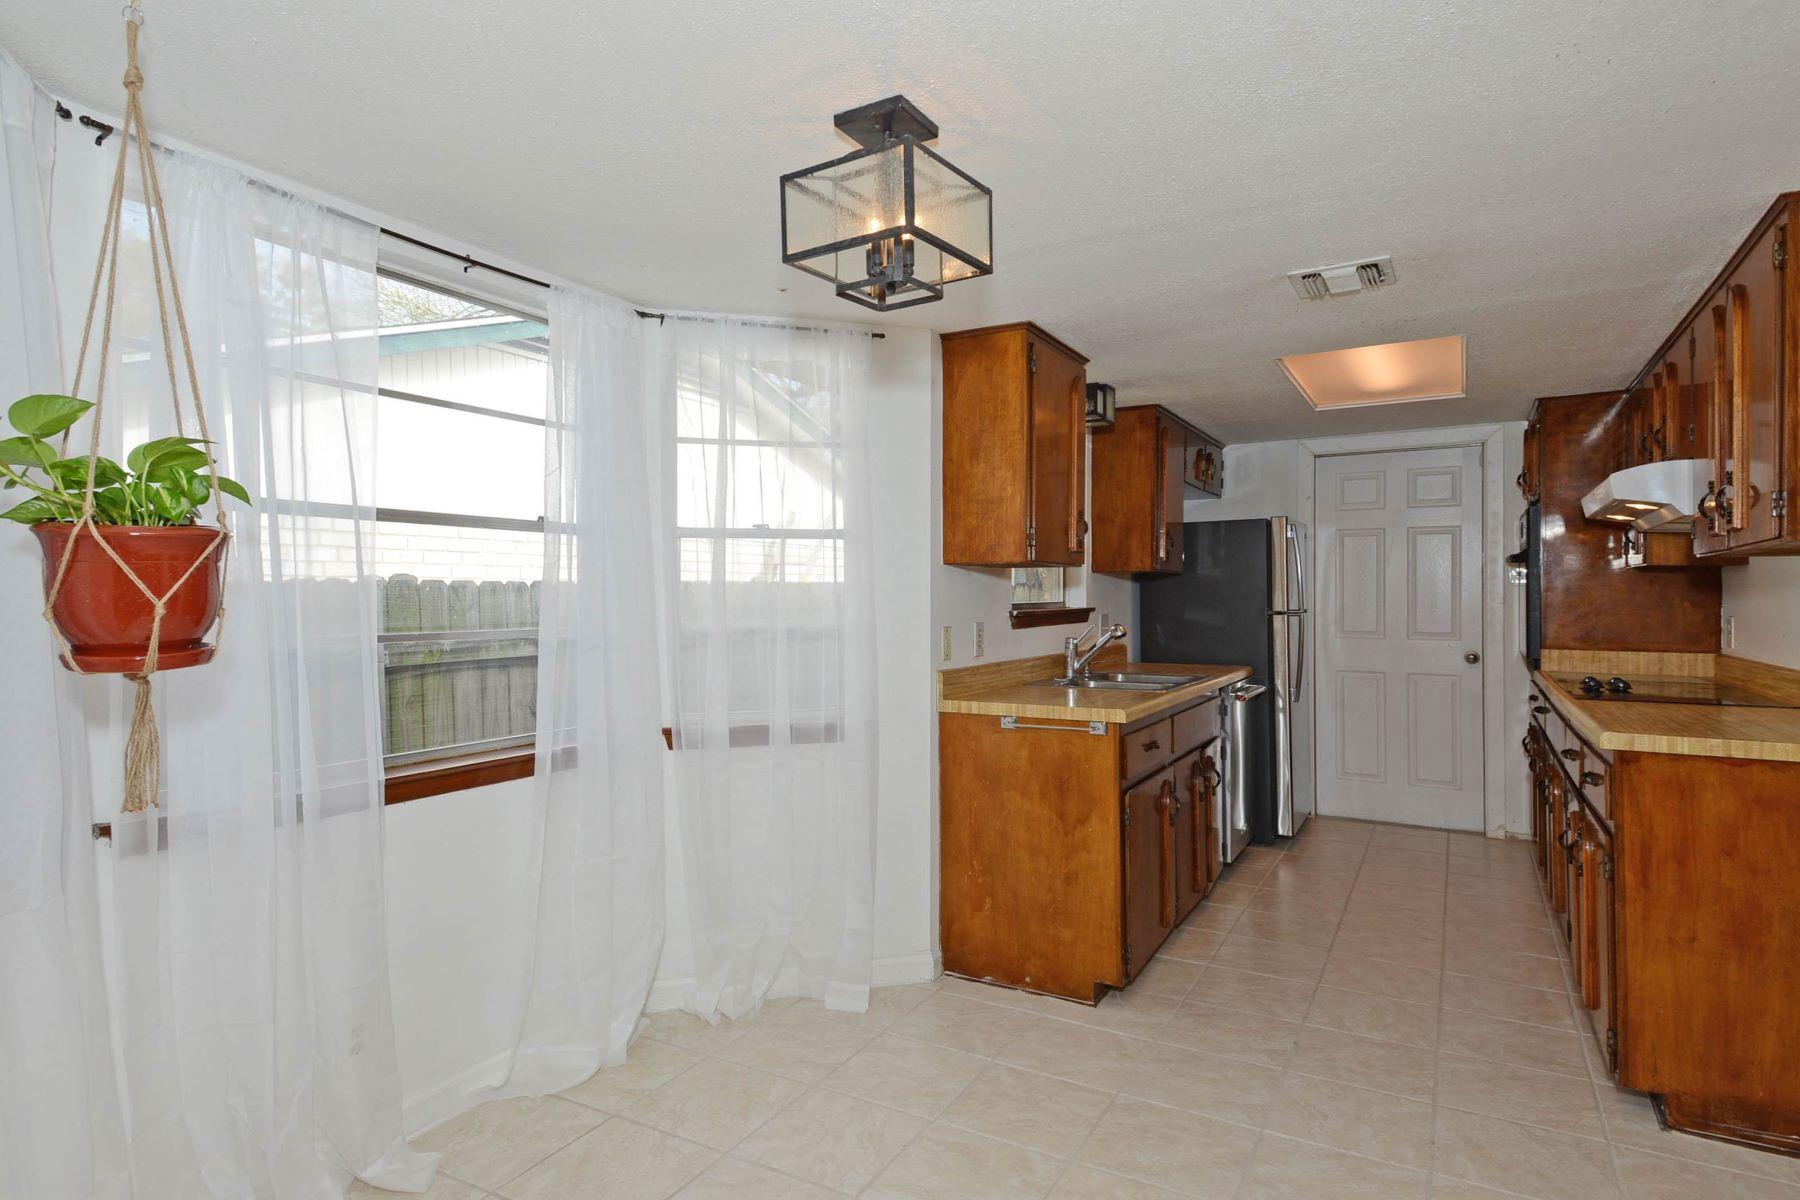 Additional photo for property listing at 8403 Brixton Lease 8403 Brixton San Antonio, Texas 78254 Estados Unidos